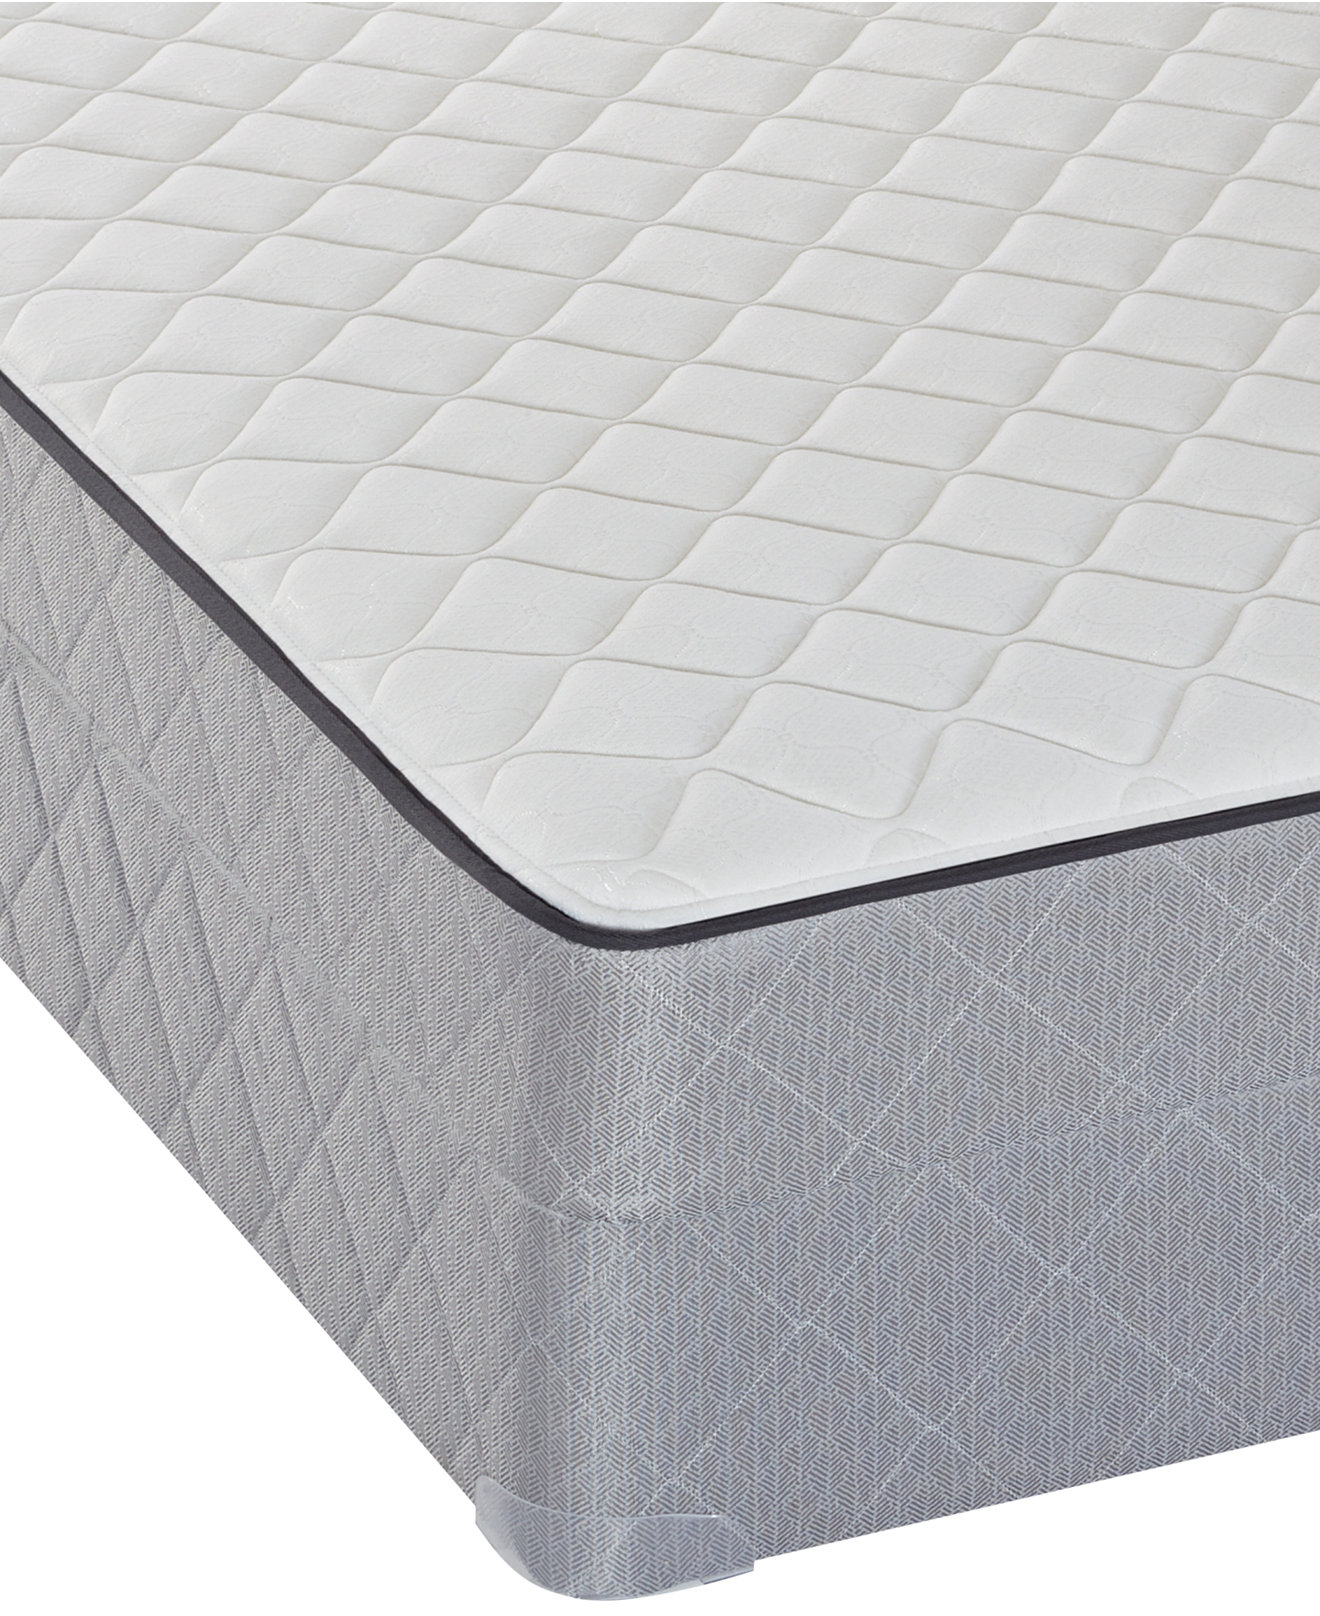 Bed making Tape Edge Bed machine